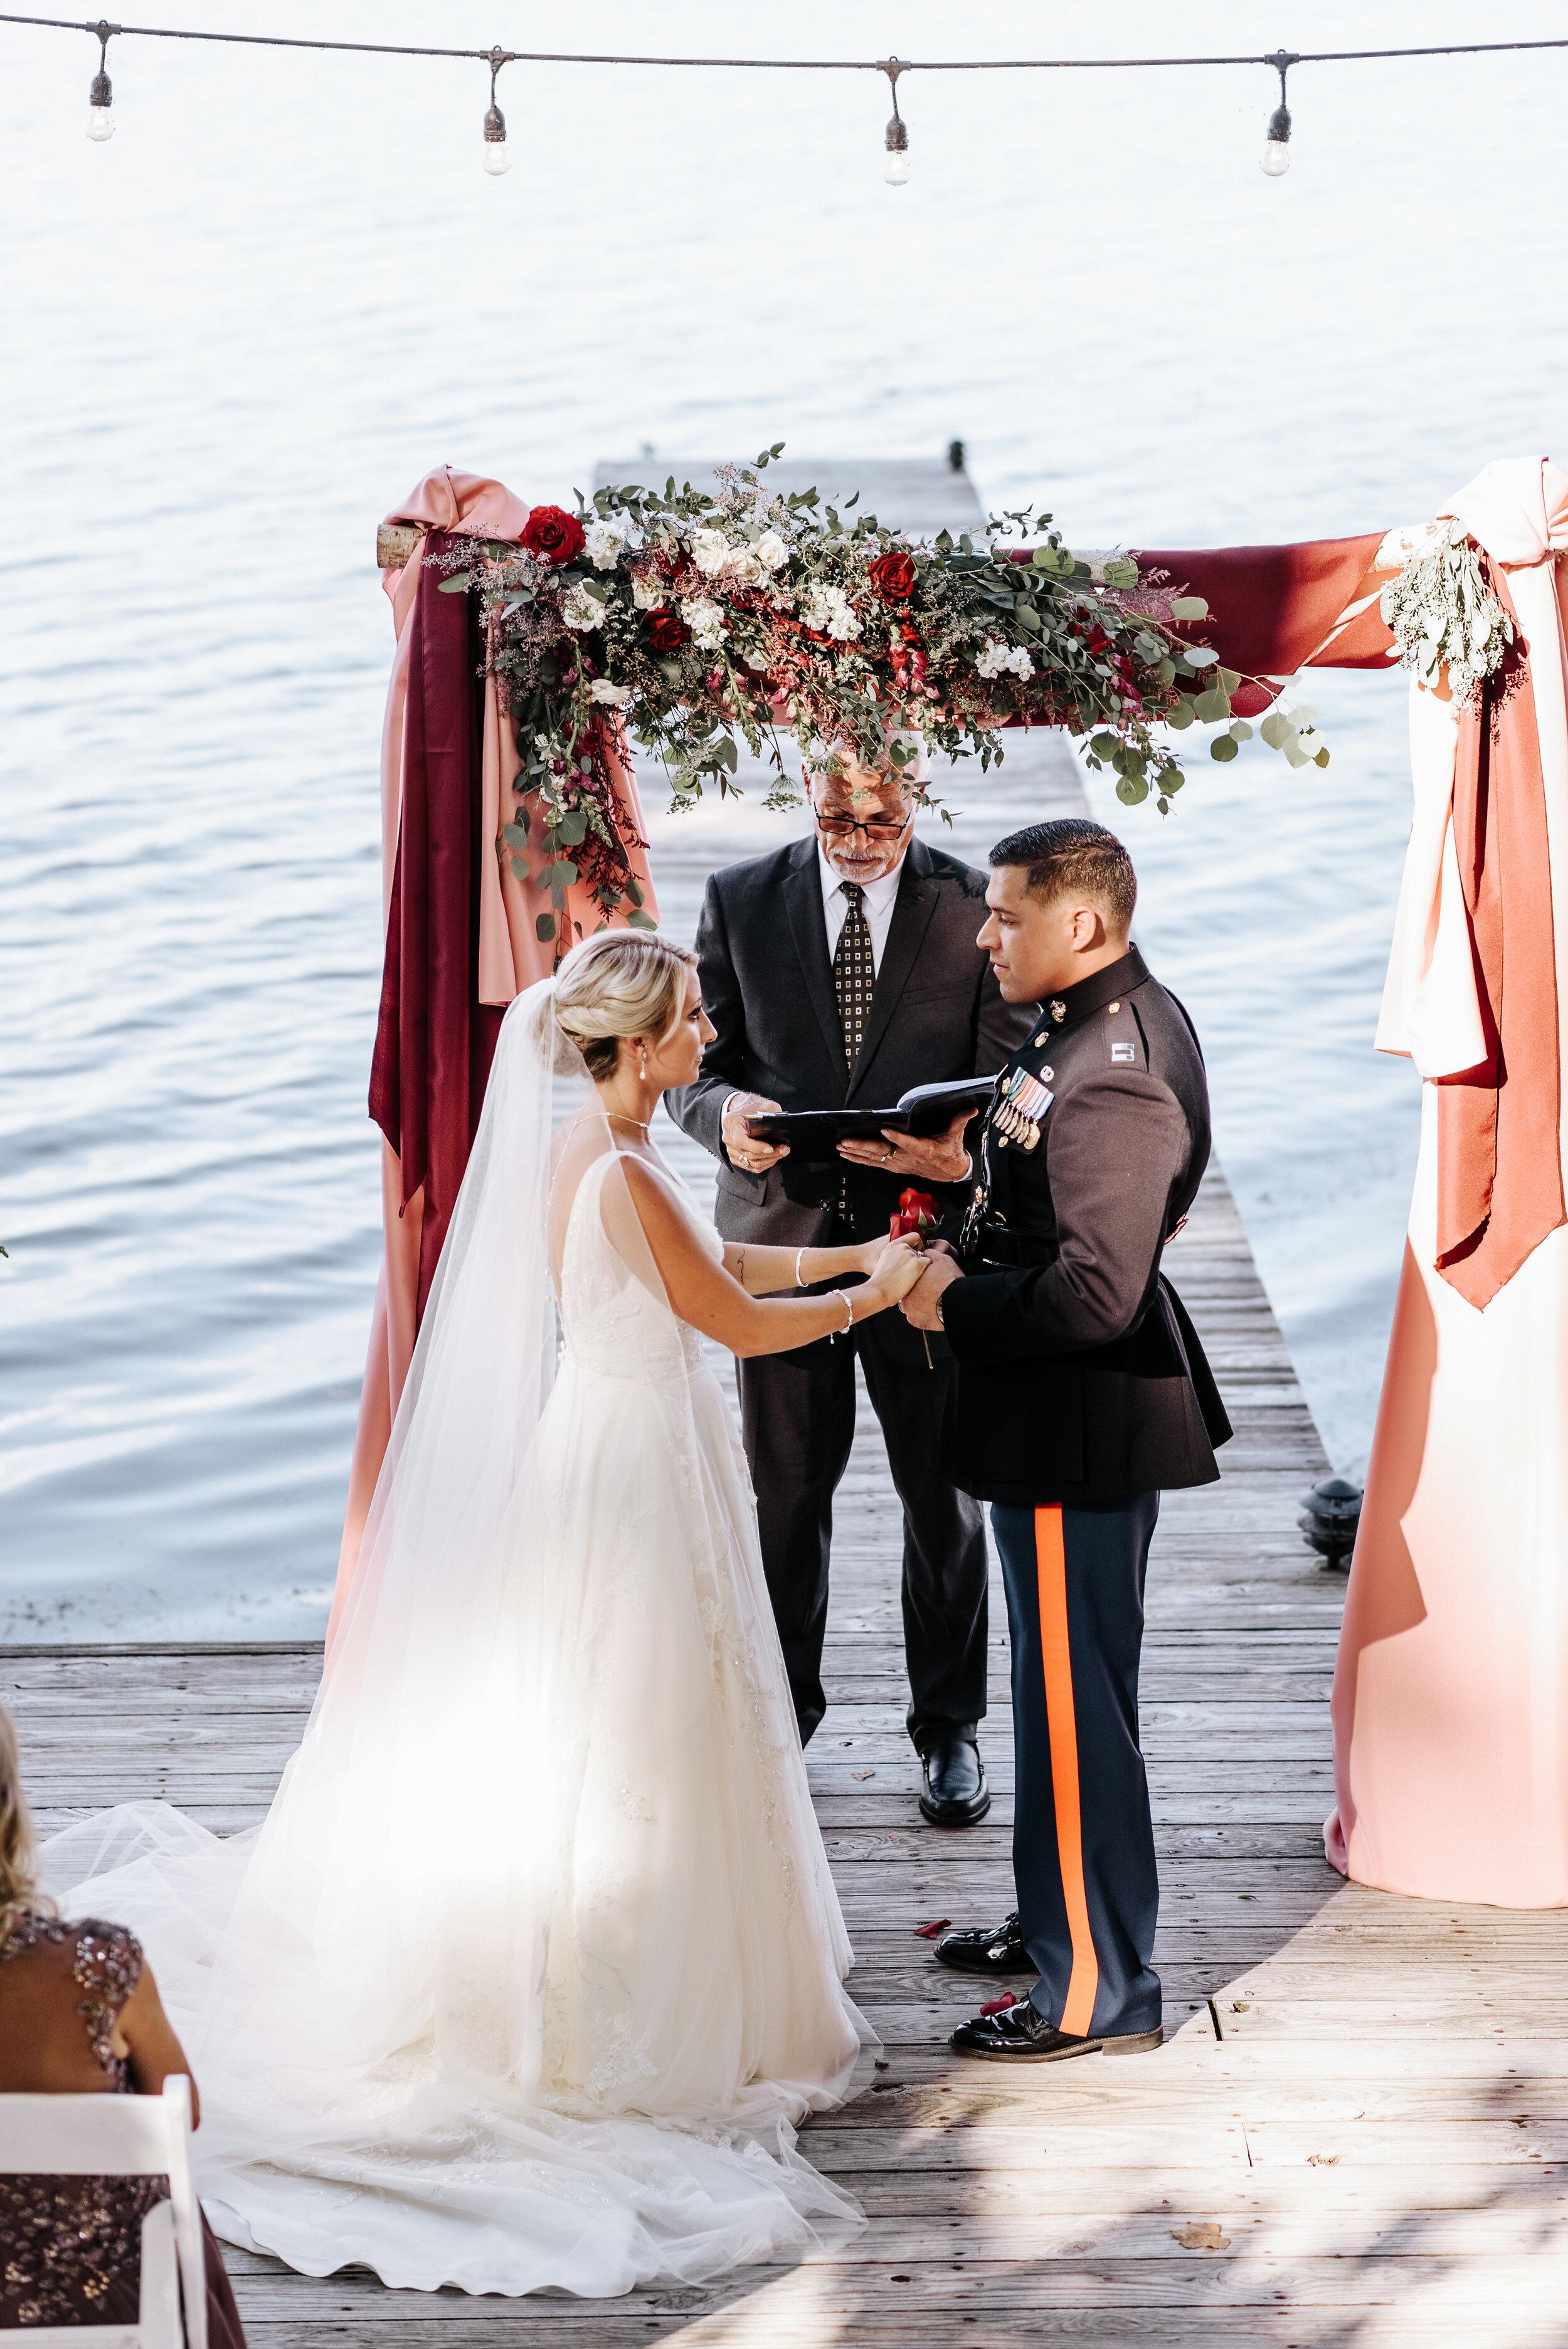 Emily_Mike_Wedding_Celebrations_at_the_Reservoir_Pool_Pavilion_Richmond_Virginia_Wedding_Photographer_Photography_by_V_50.jpg